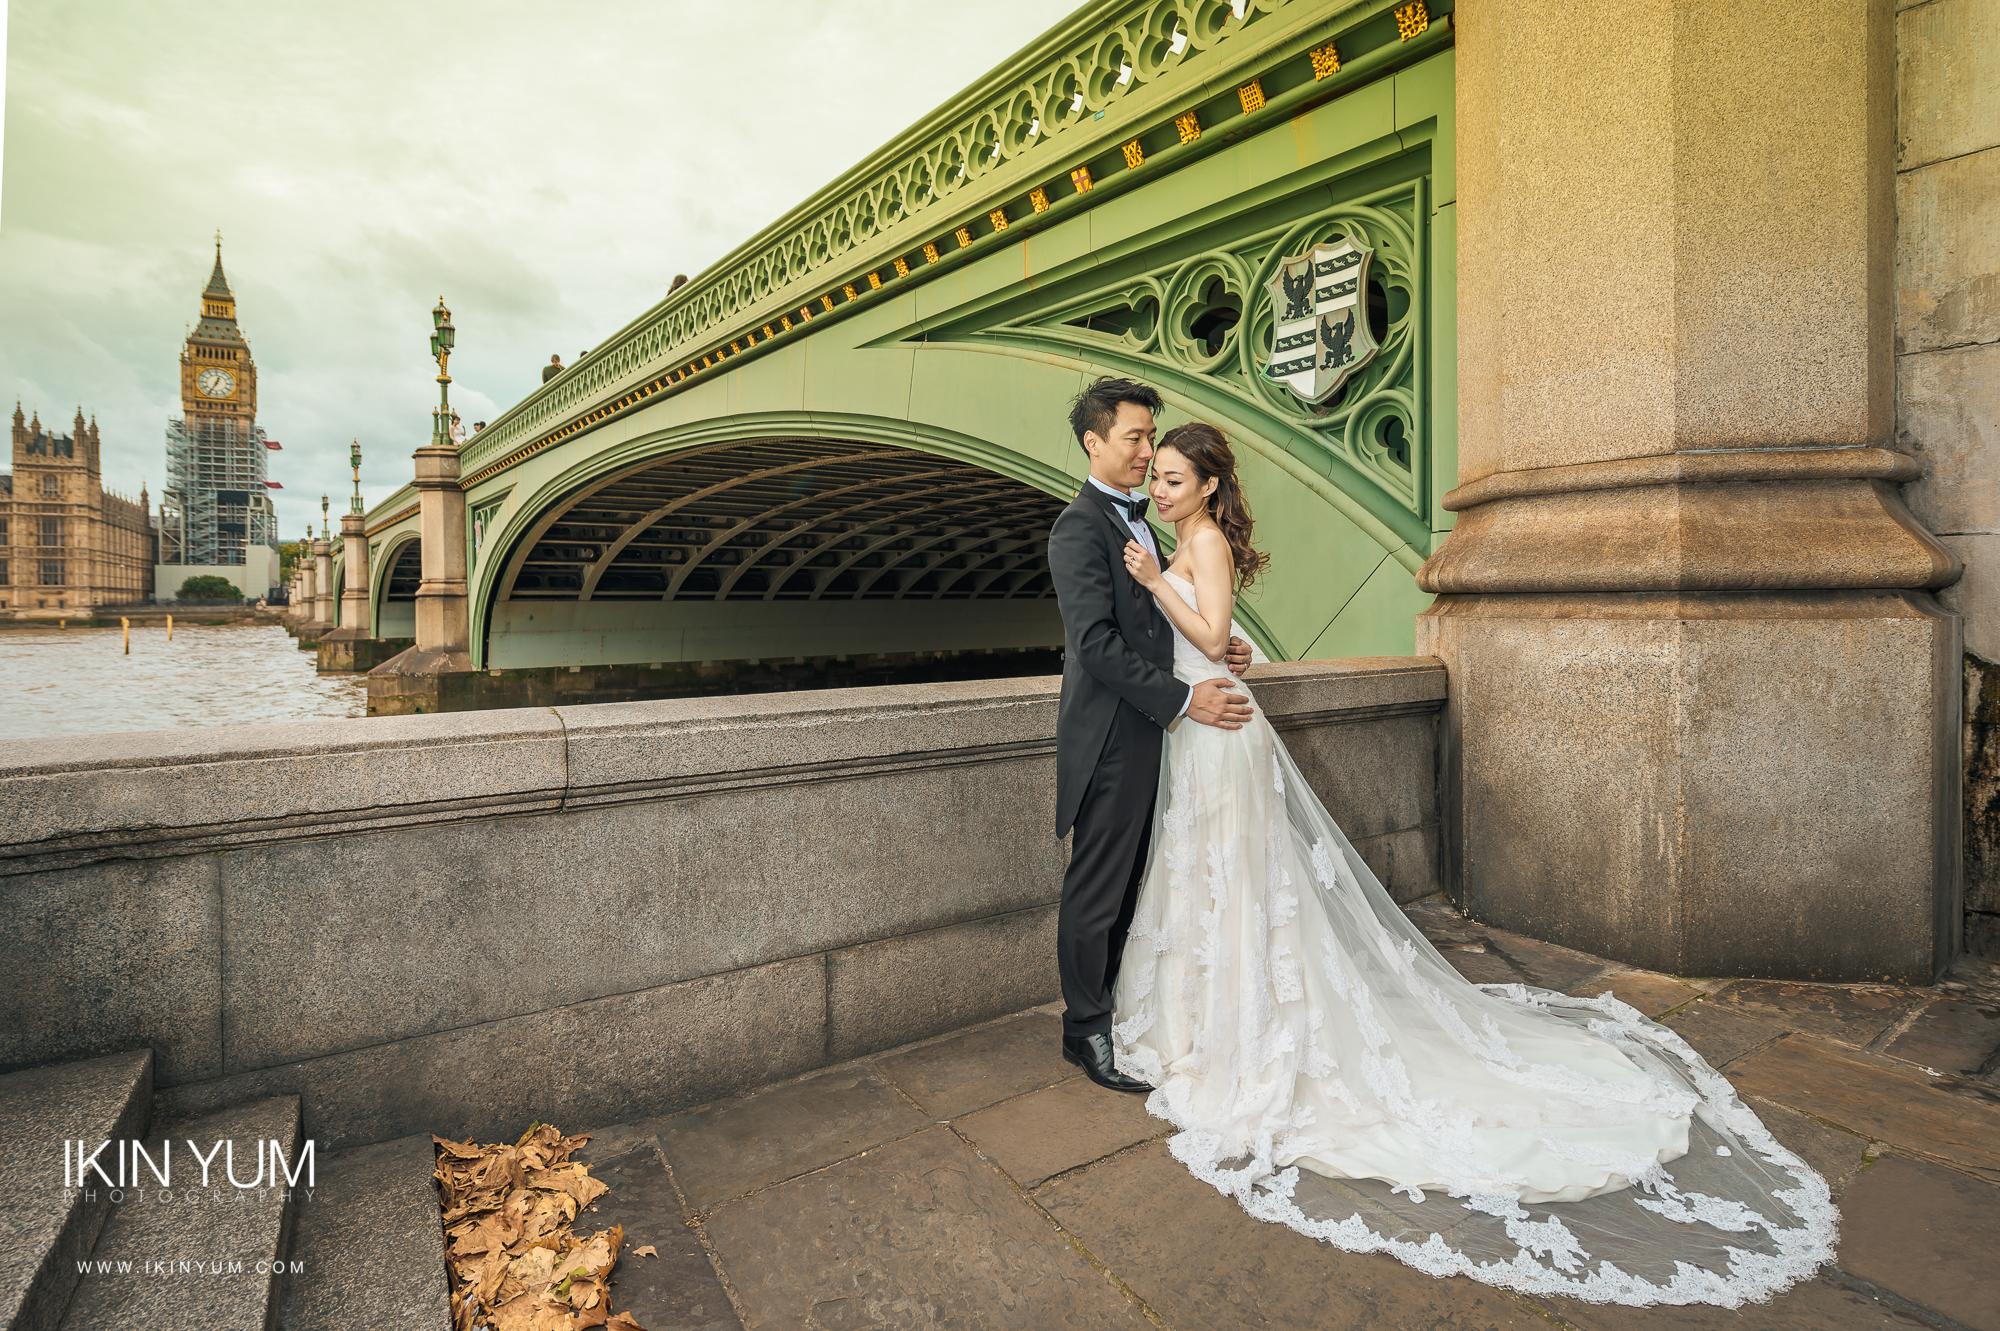 Yannis & Kenny Pre-Wedding Shoot - Ikin Yum Photography-0110.jpg